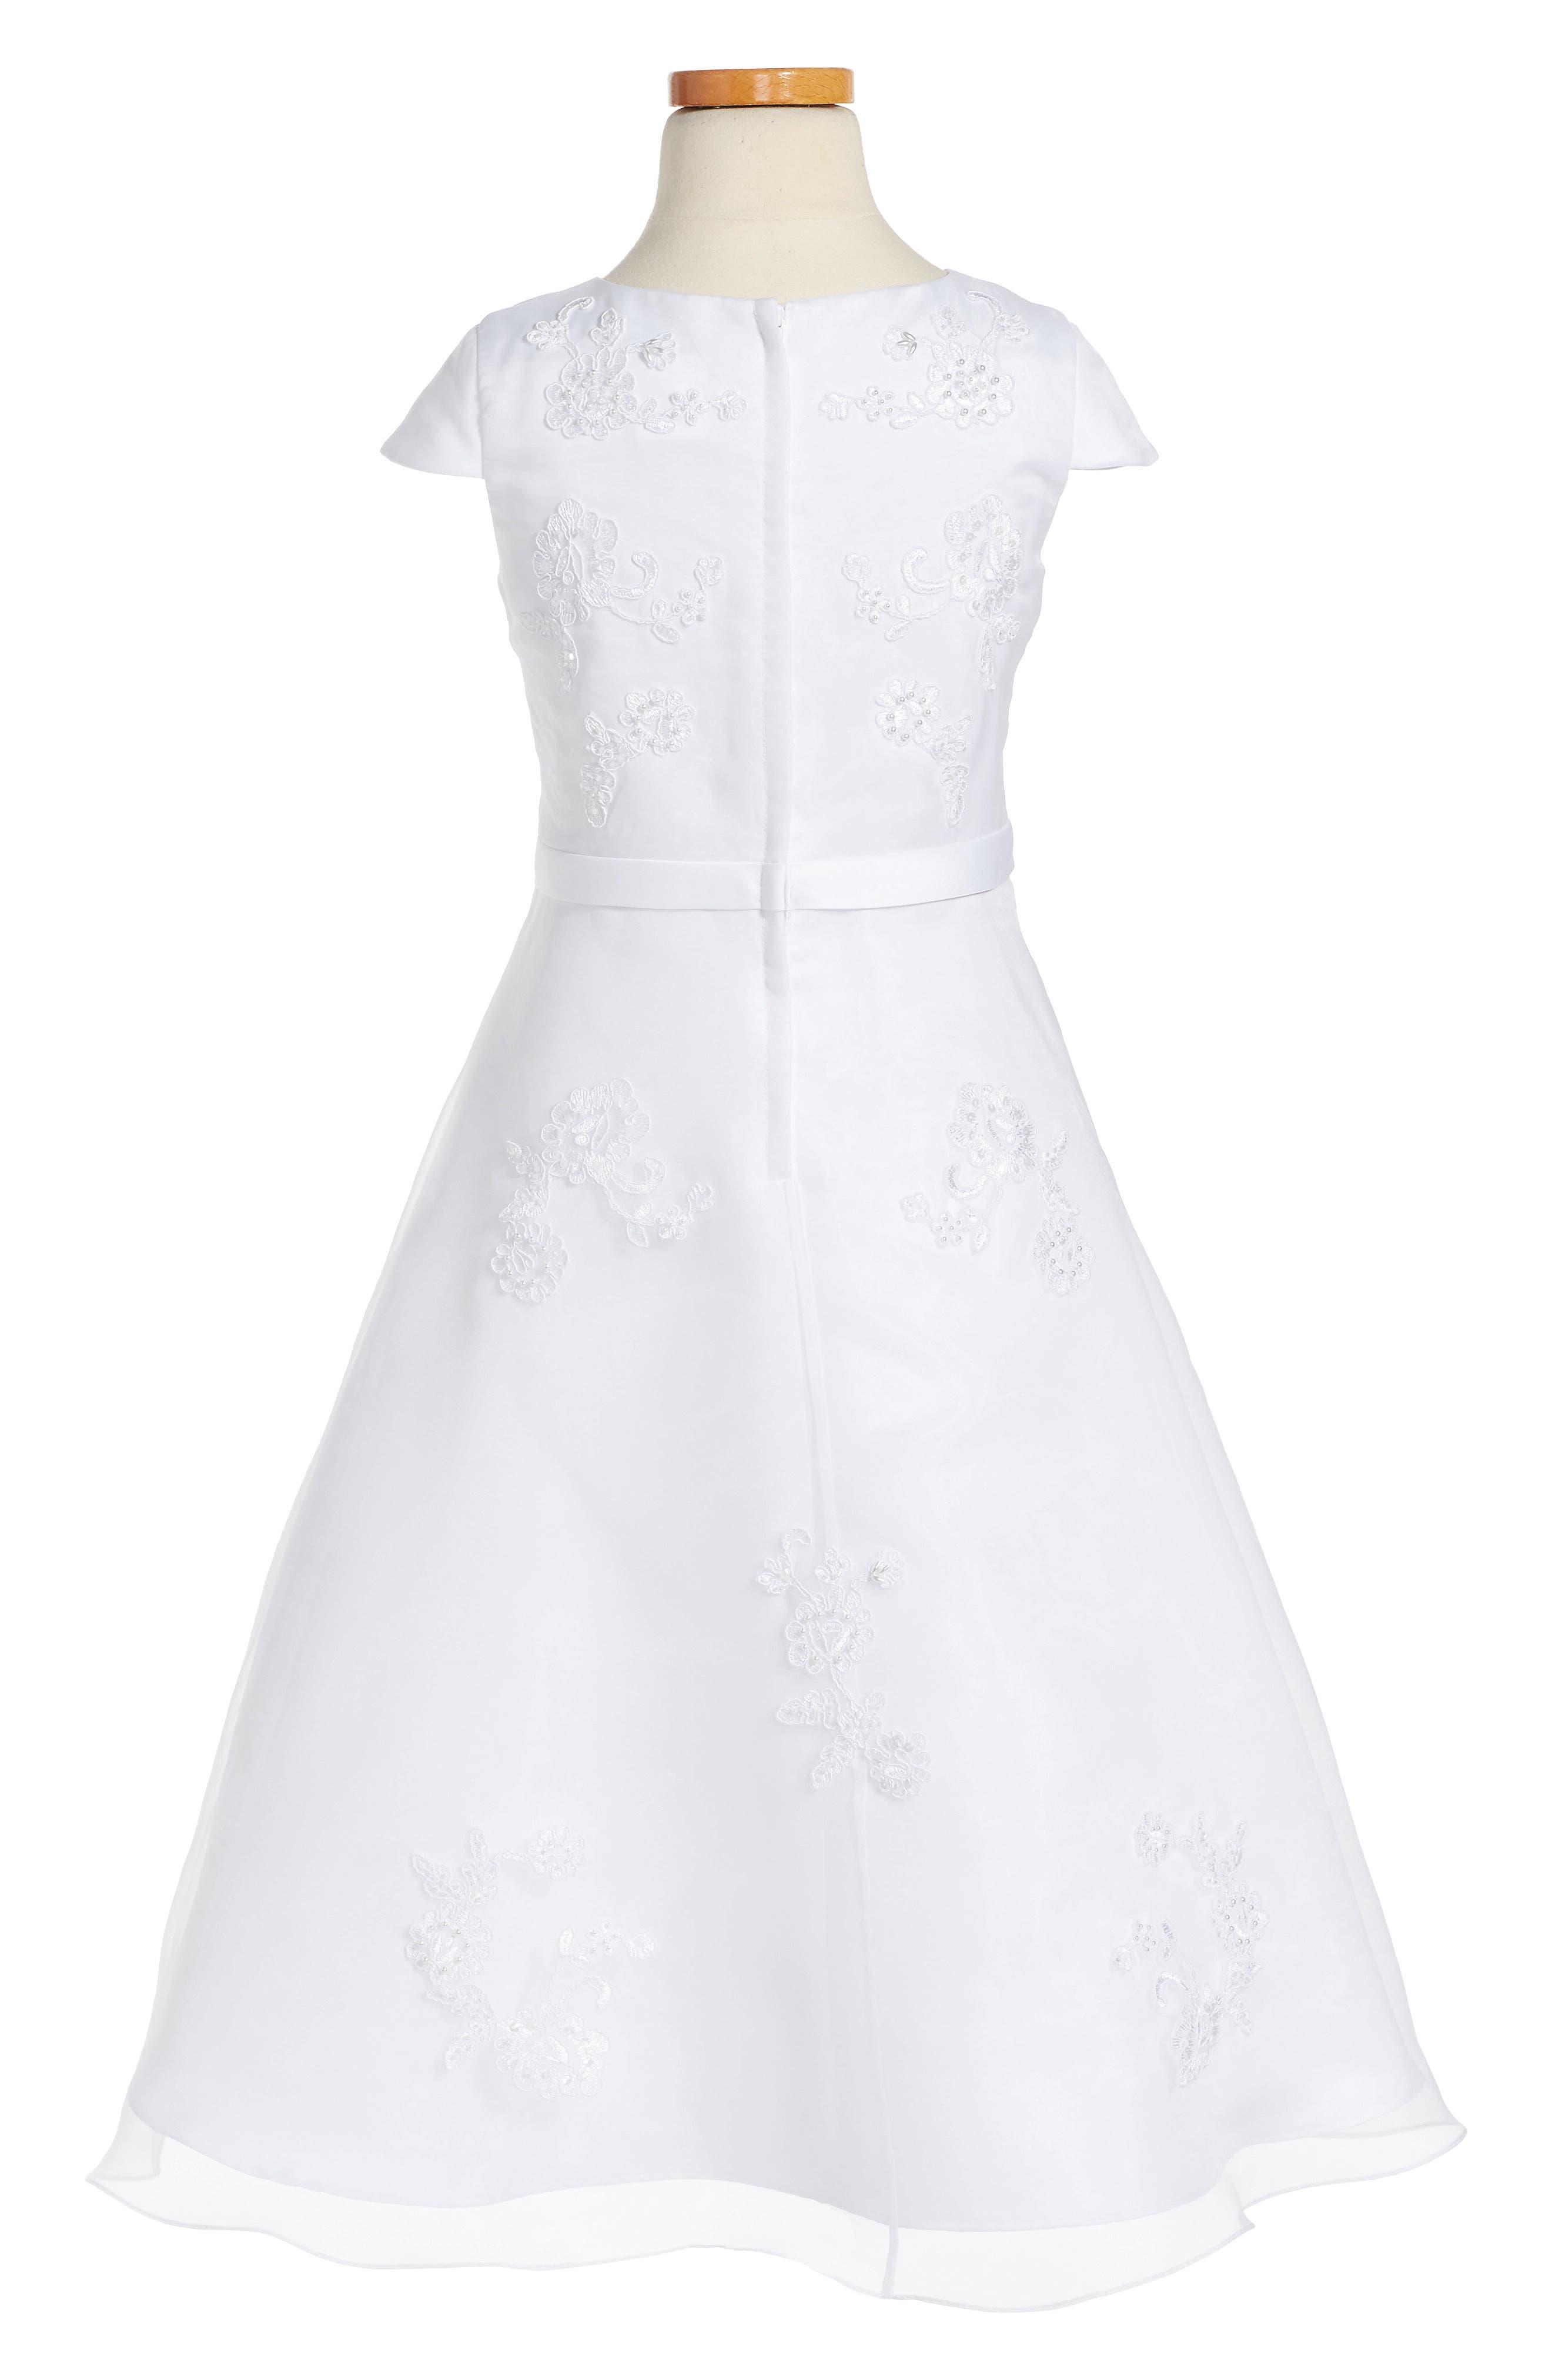 Lace Floral Fit & Flare Dress,                             Alternate thumbnail 2, color,                             WHITE